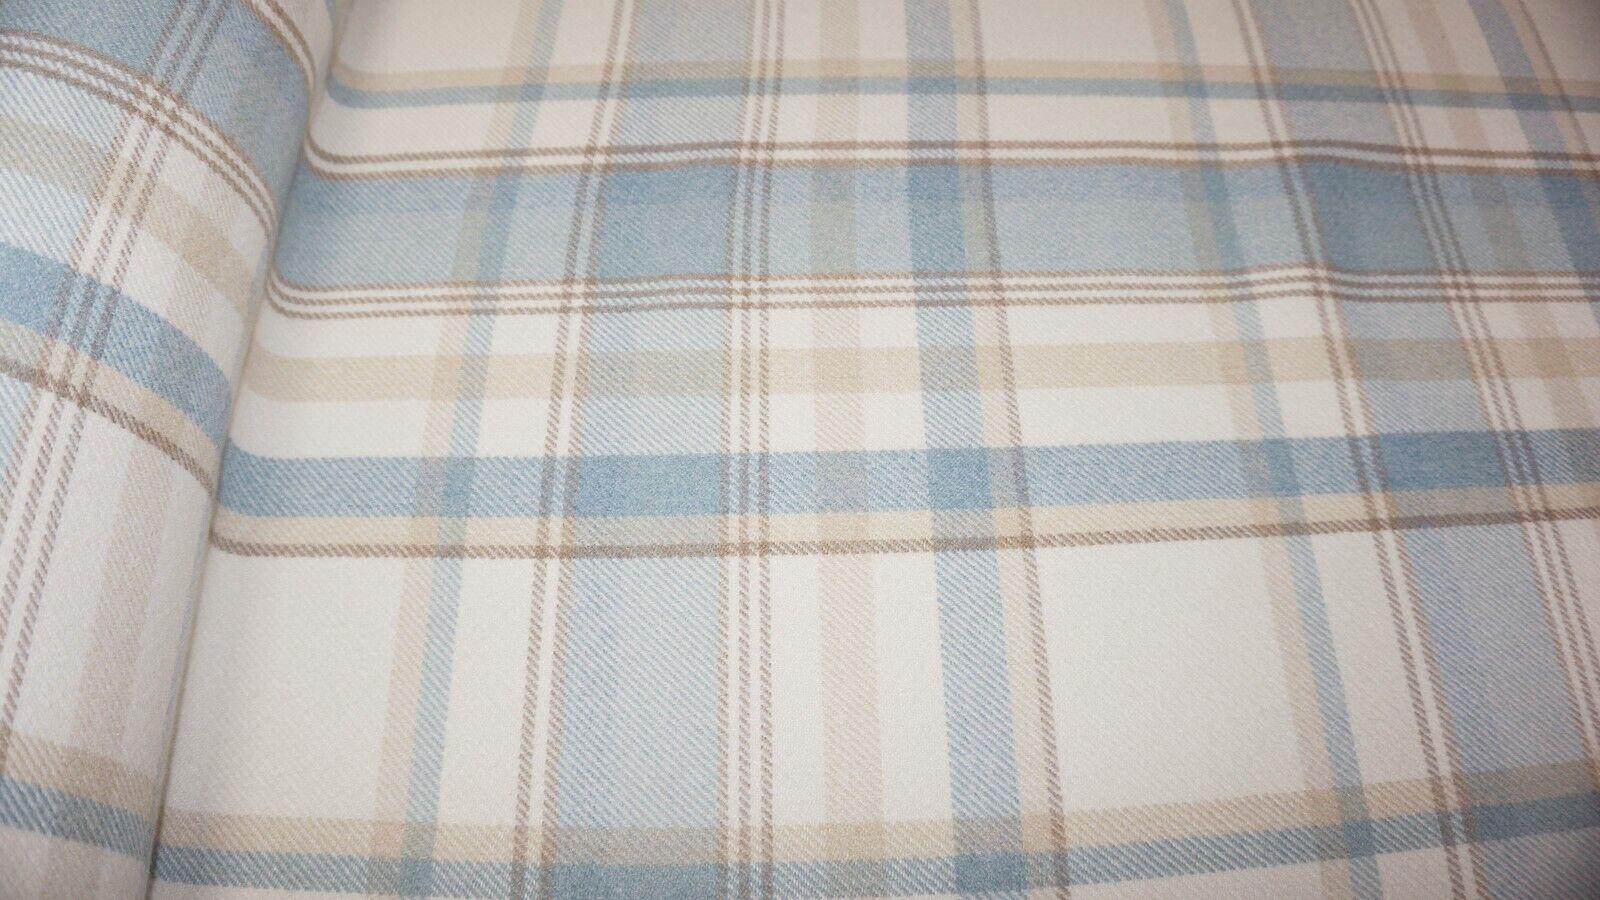 Parisian Balmoral Wool Effect Tartan Upholstery Curtain Fabric SKY BLUE Skye